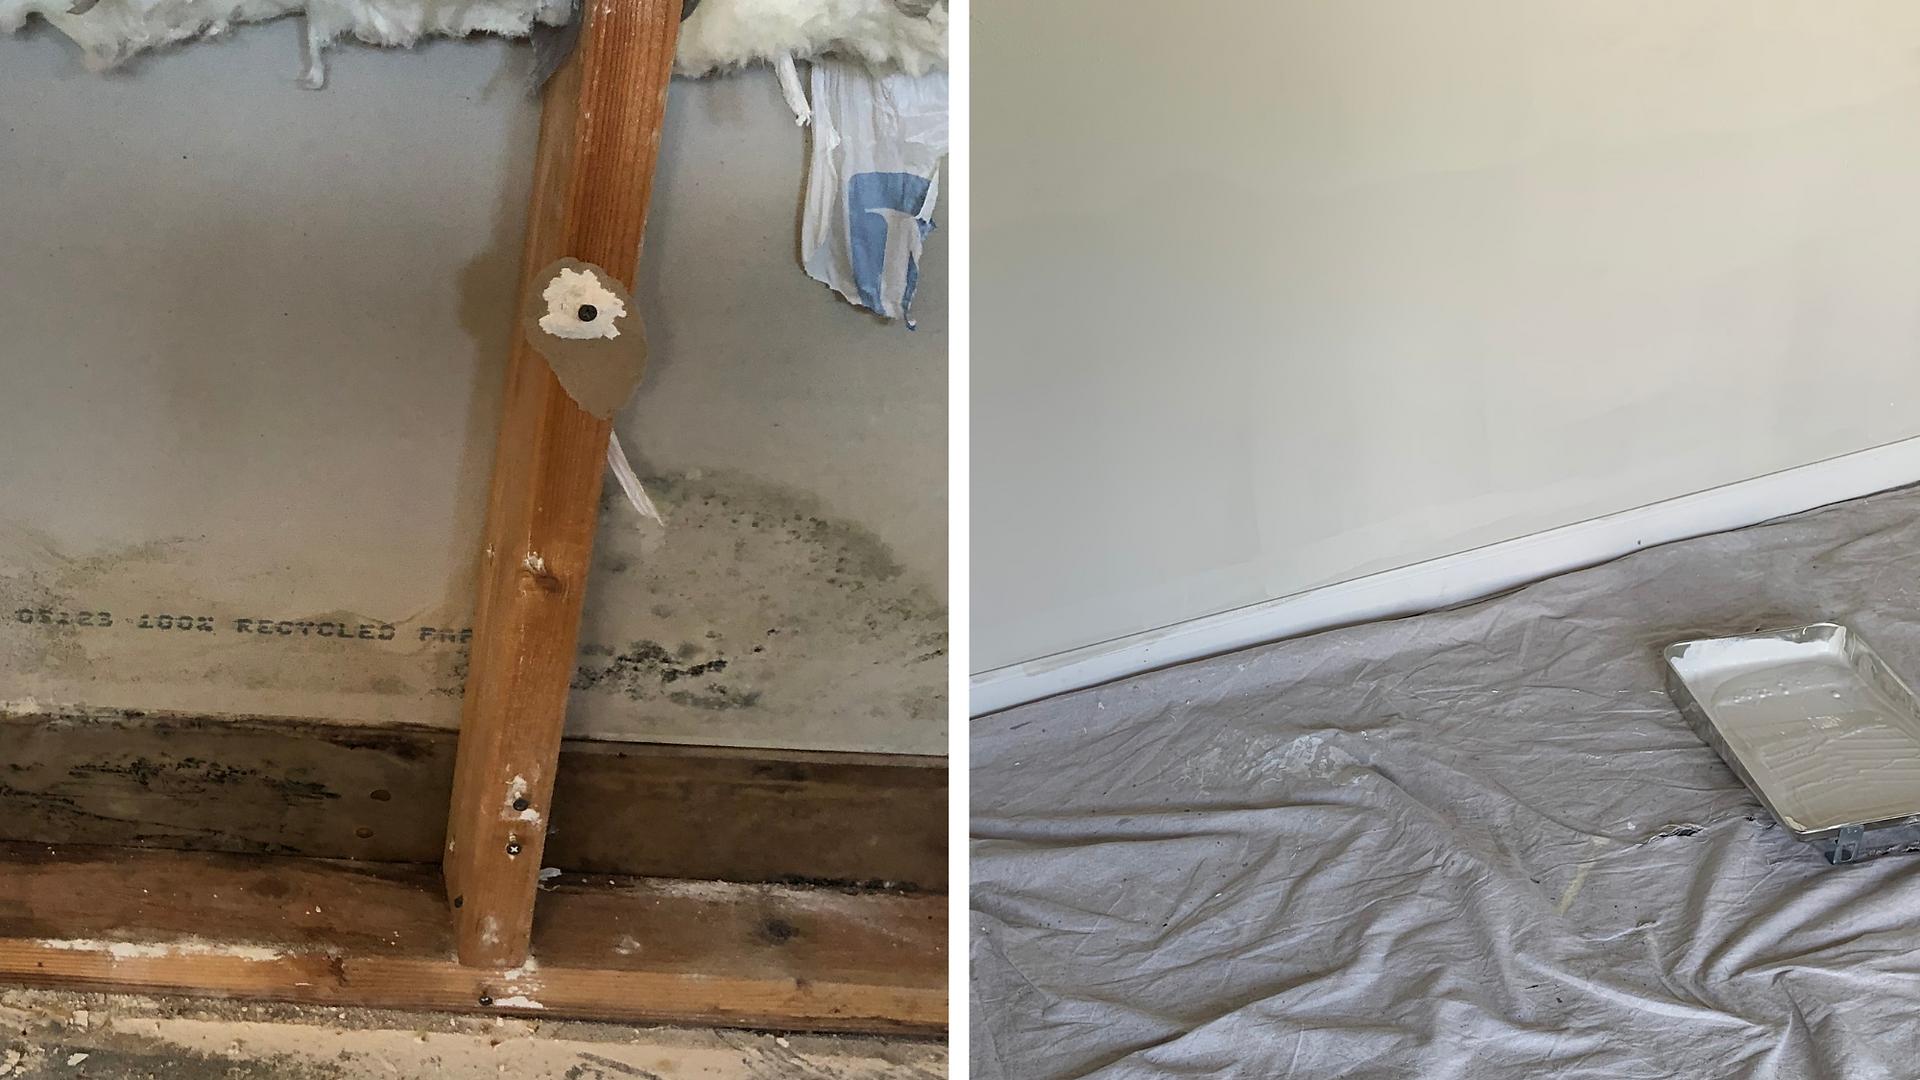 Water Damage in Home Treated Through Garage